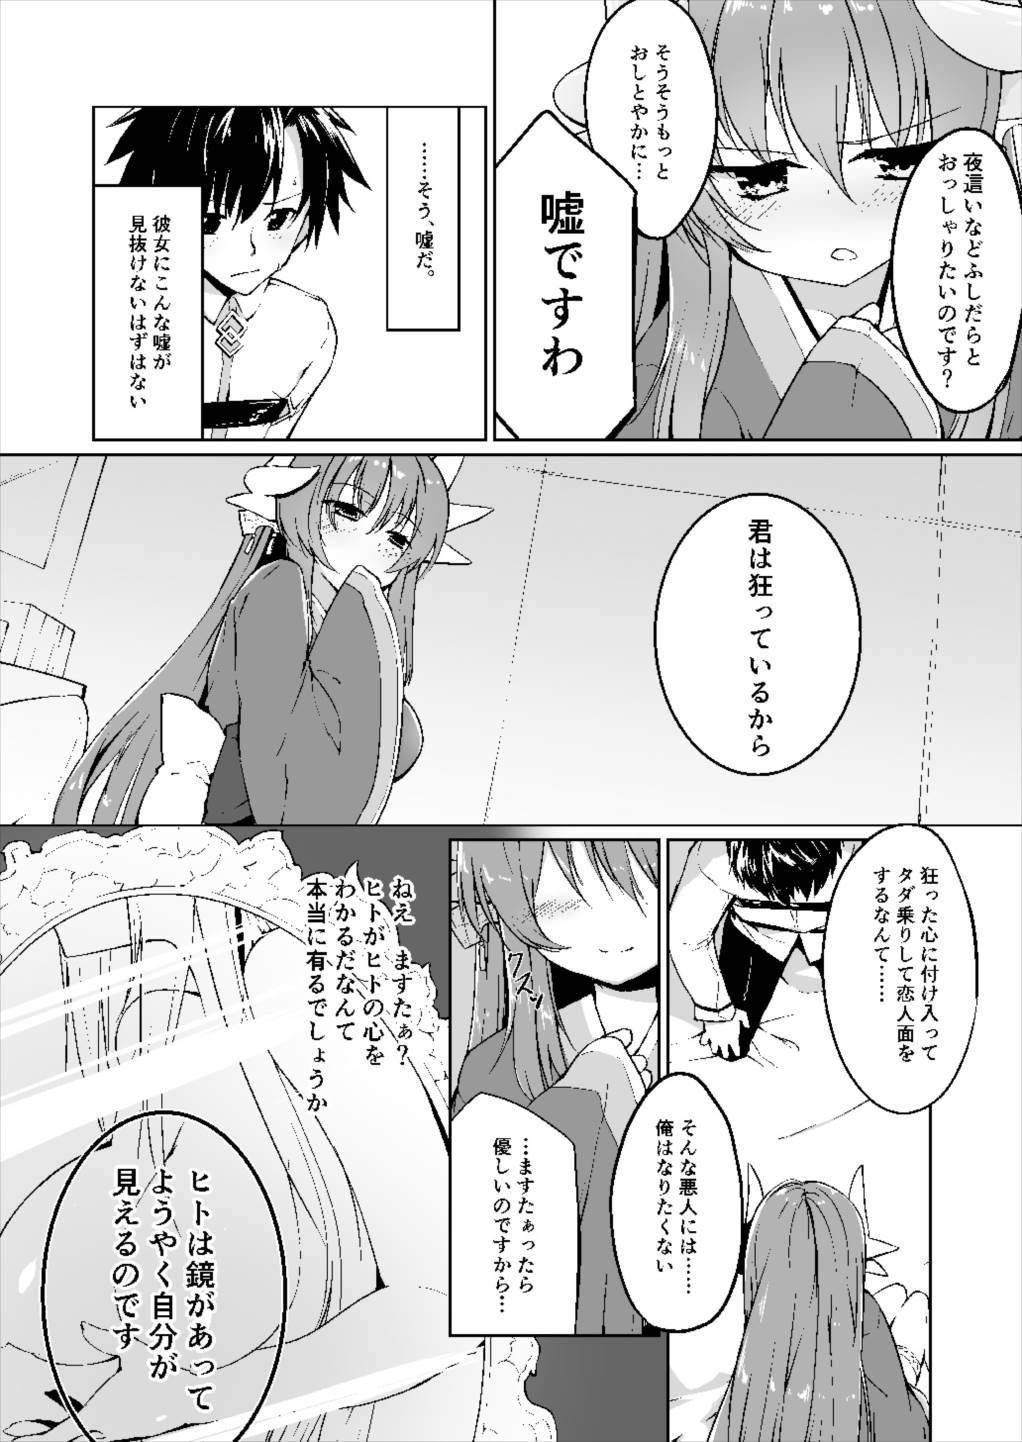 Kiyohime Lovers Vol. 01 - Kiyohime to Hajimete 5